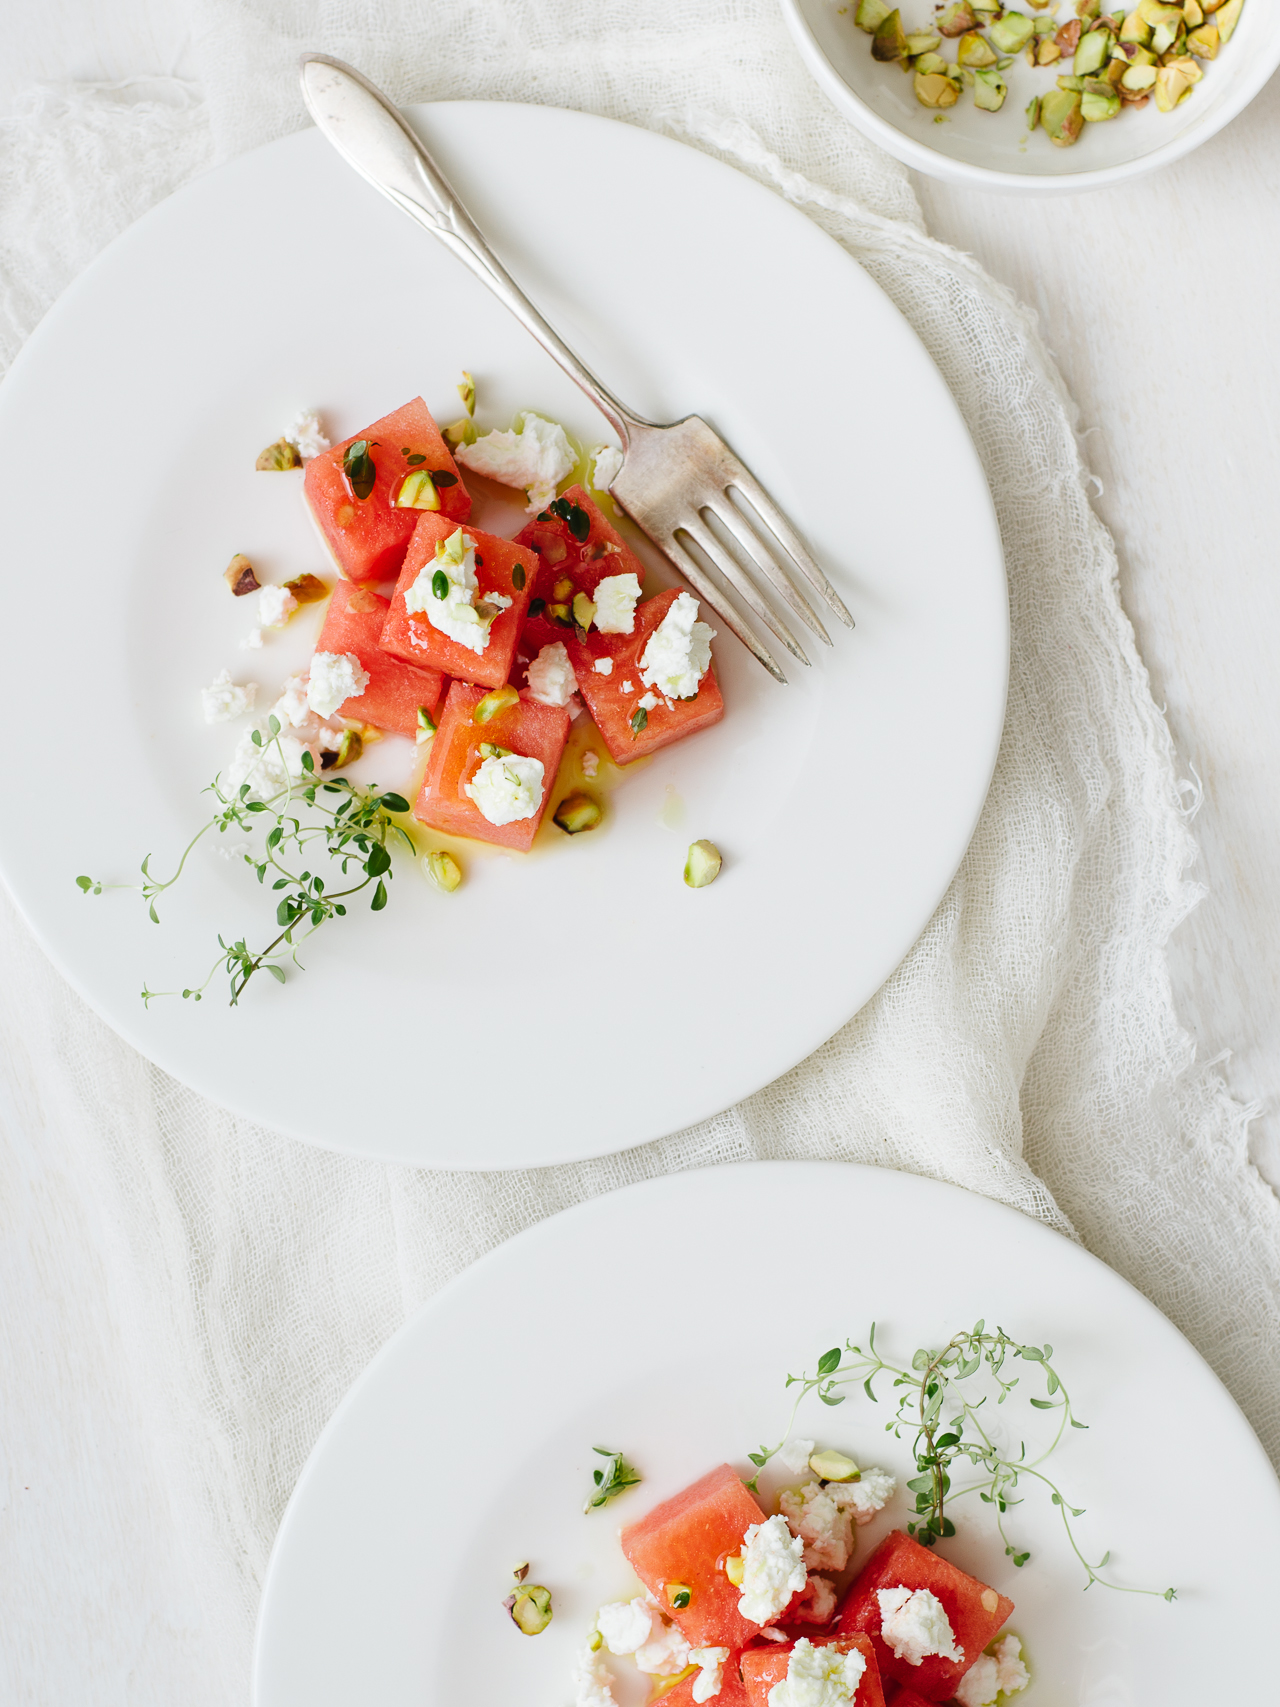 Summer Watermelon Salad | Flavors of Light